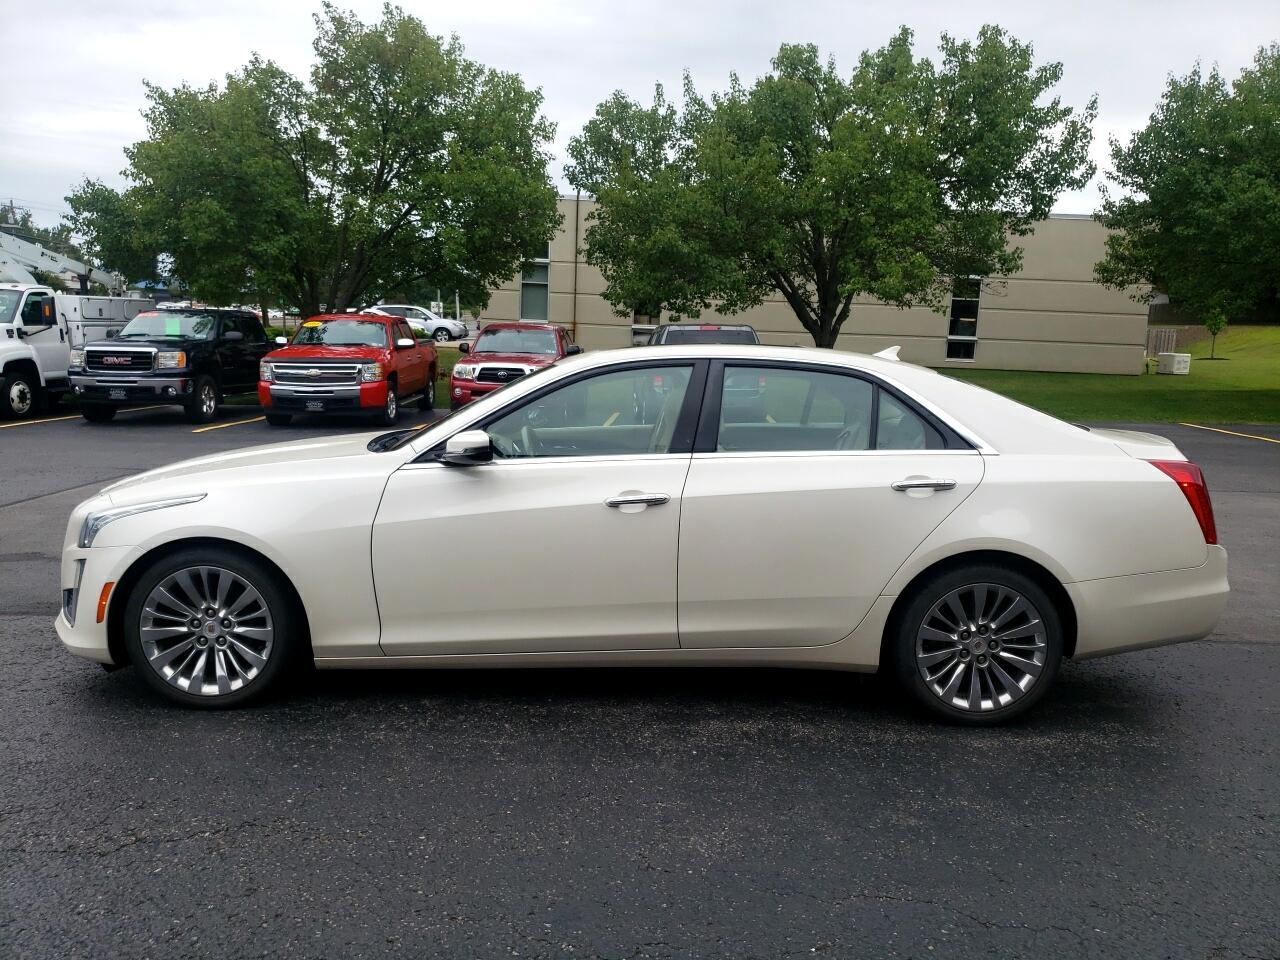 Cadillac CTS Sedan 4dr Sdn 2.0L Turbo Luxury AWD 2014